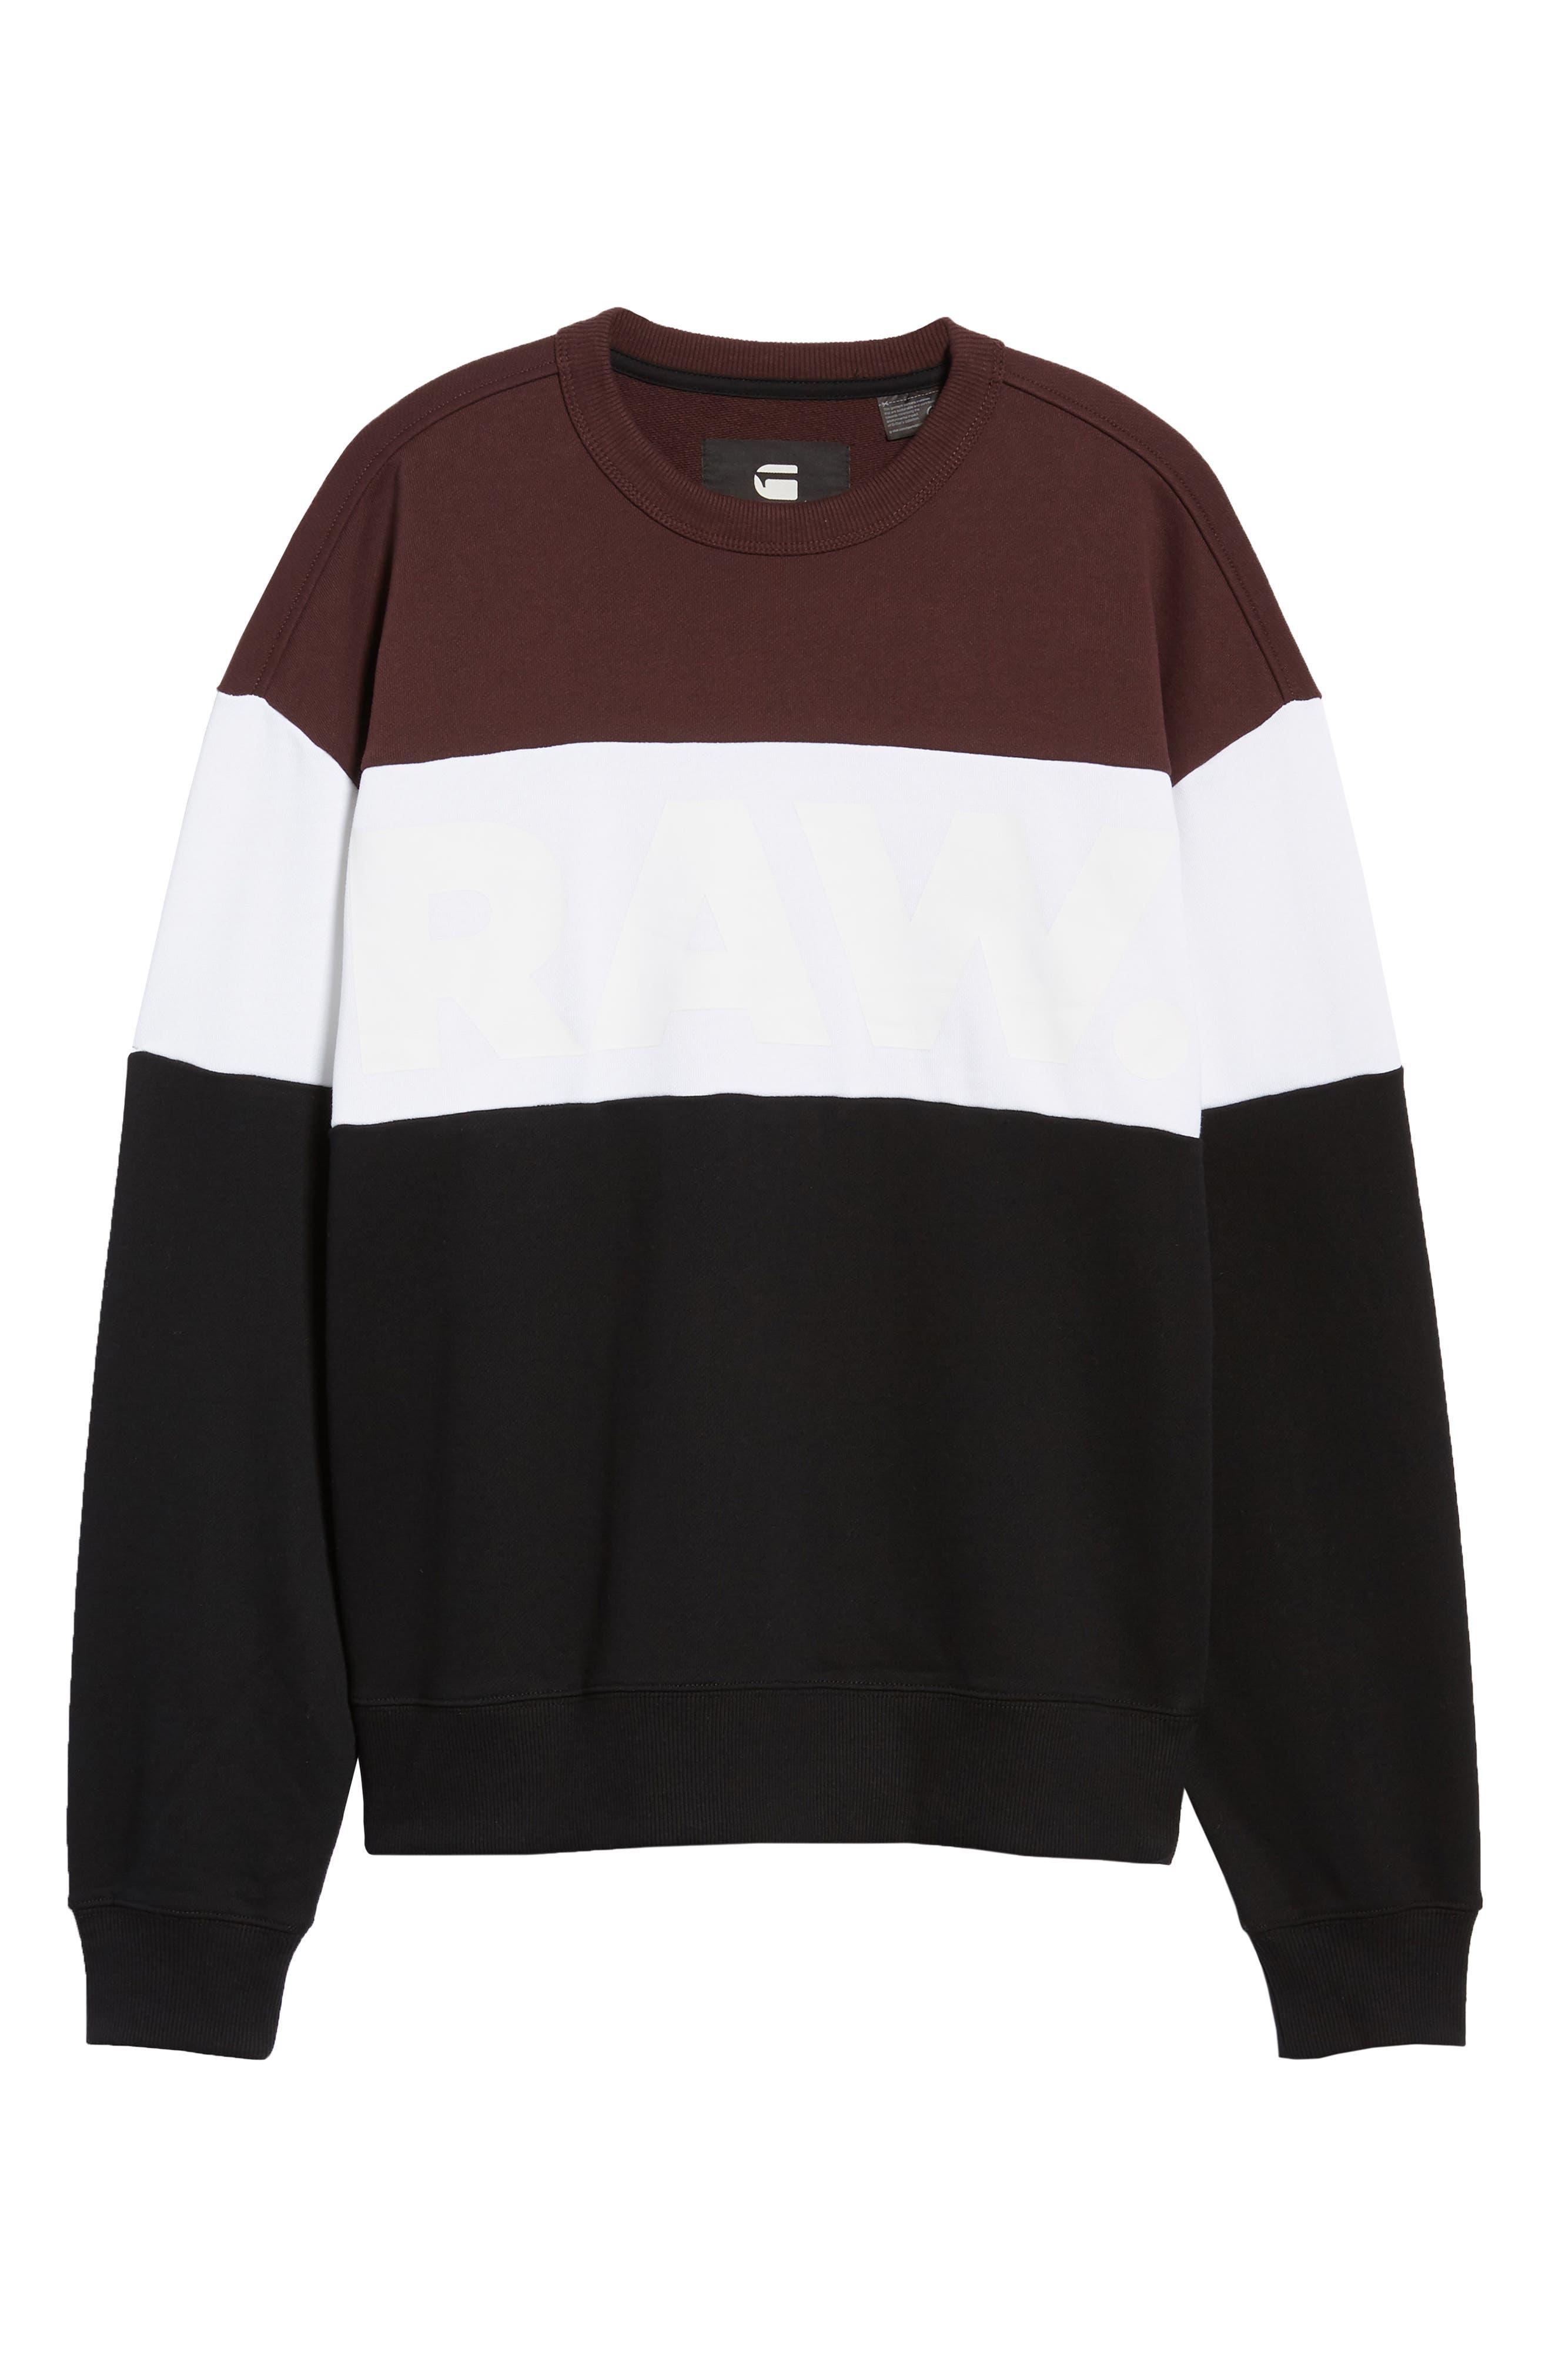 Libe Core Colorblock Sweatshirt,                             Alternate thumbnail 6, color,                             001